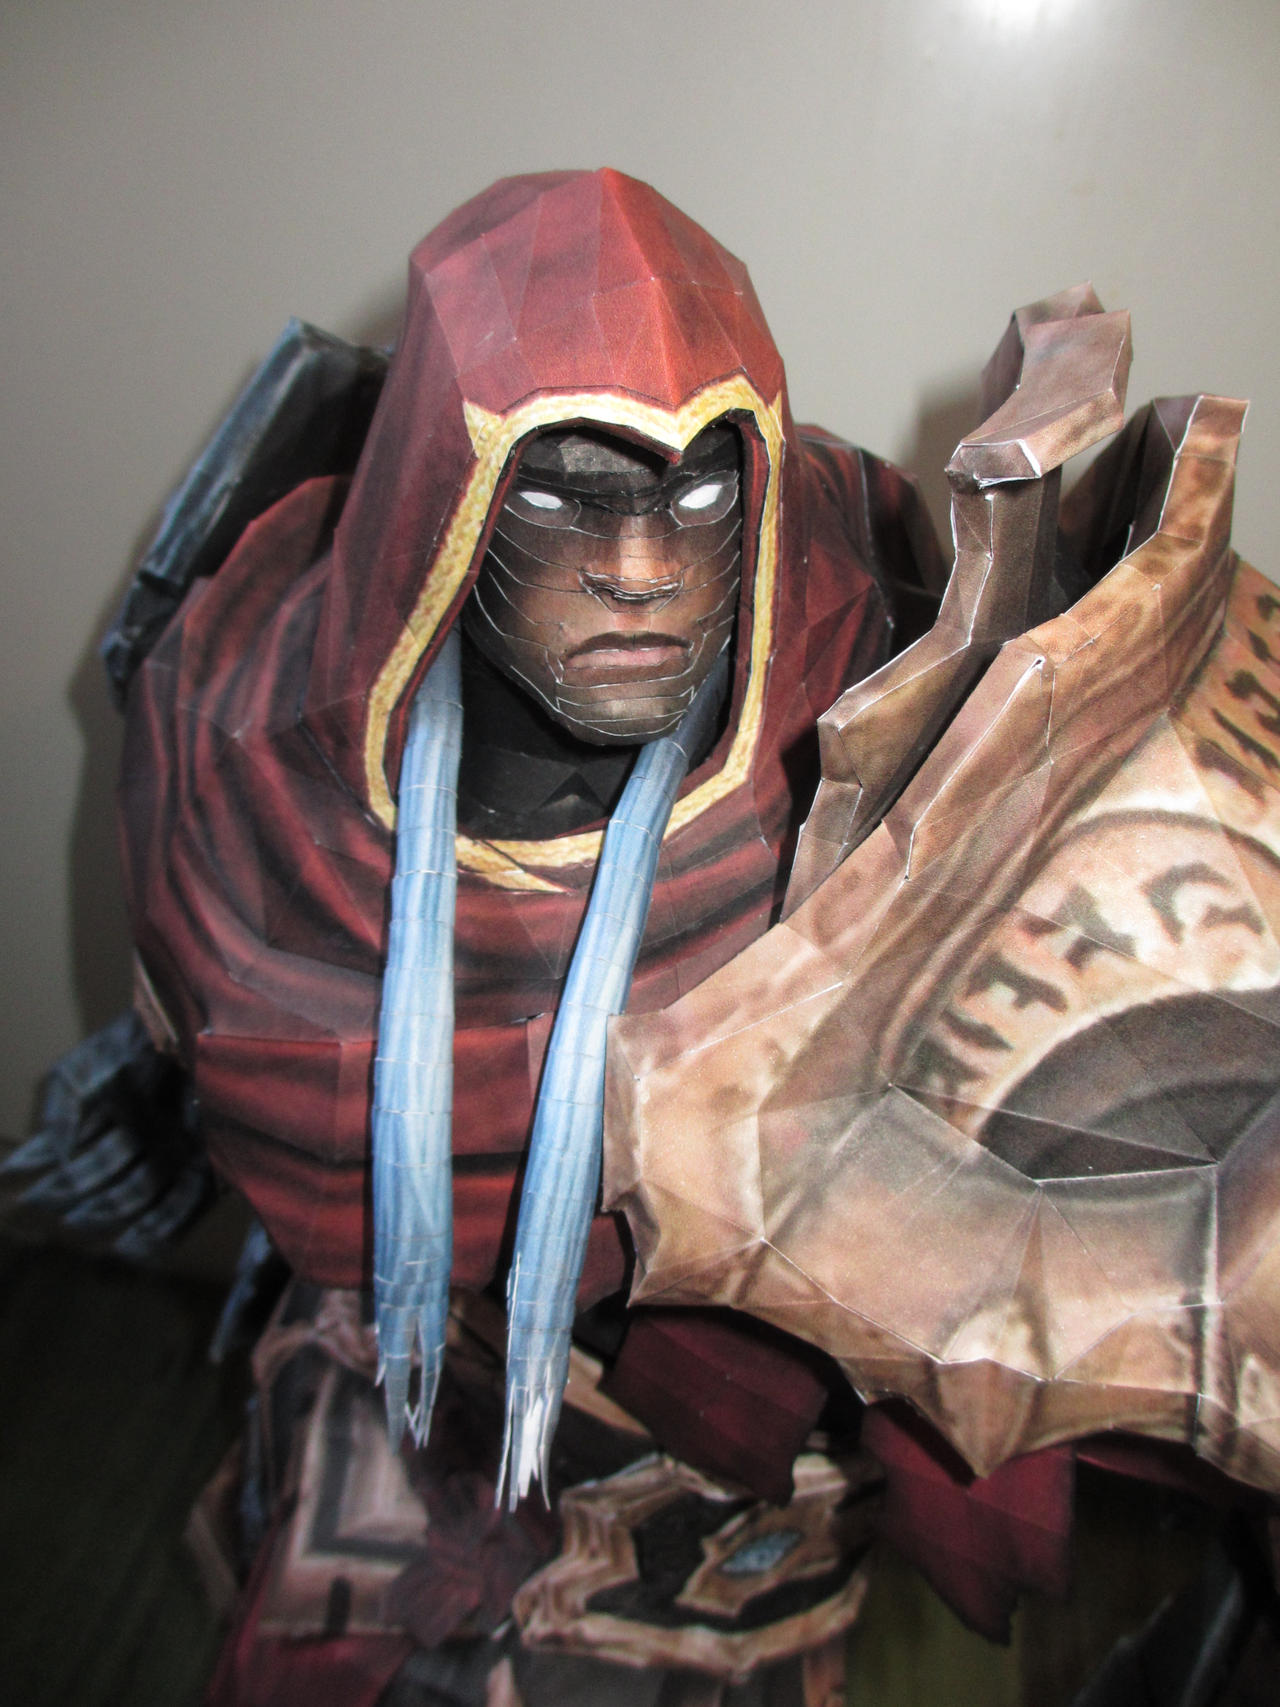 War from Darksiders papercraft face closeup by minidelirium